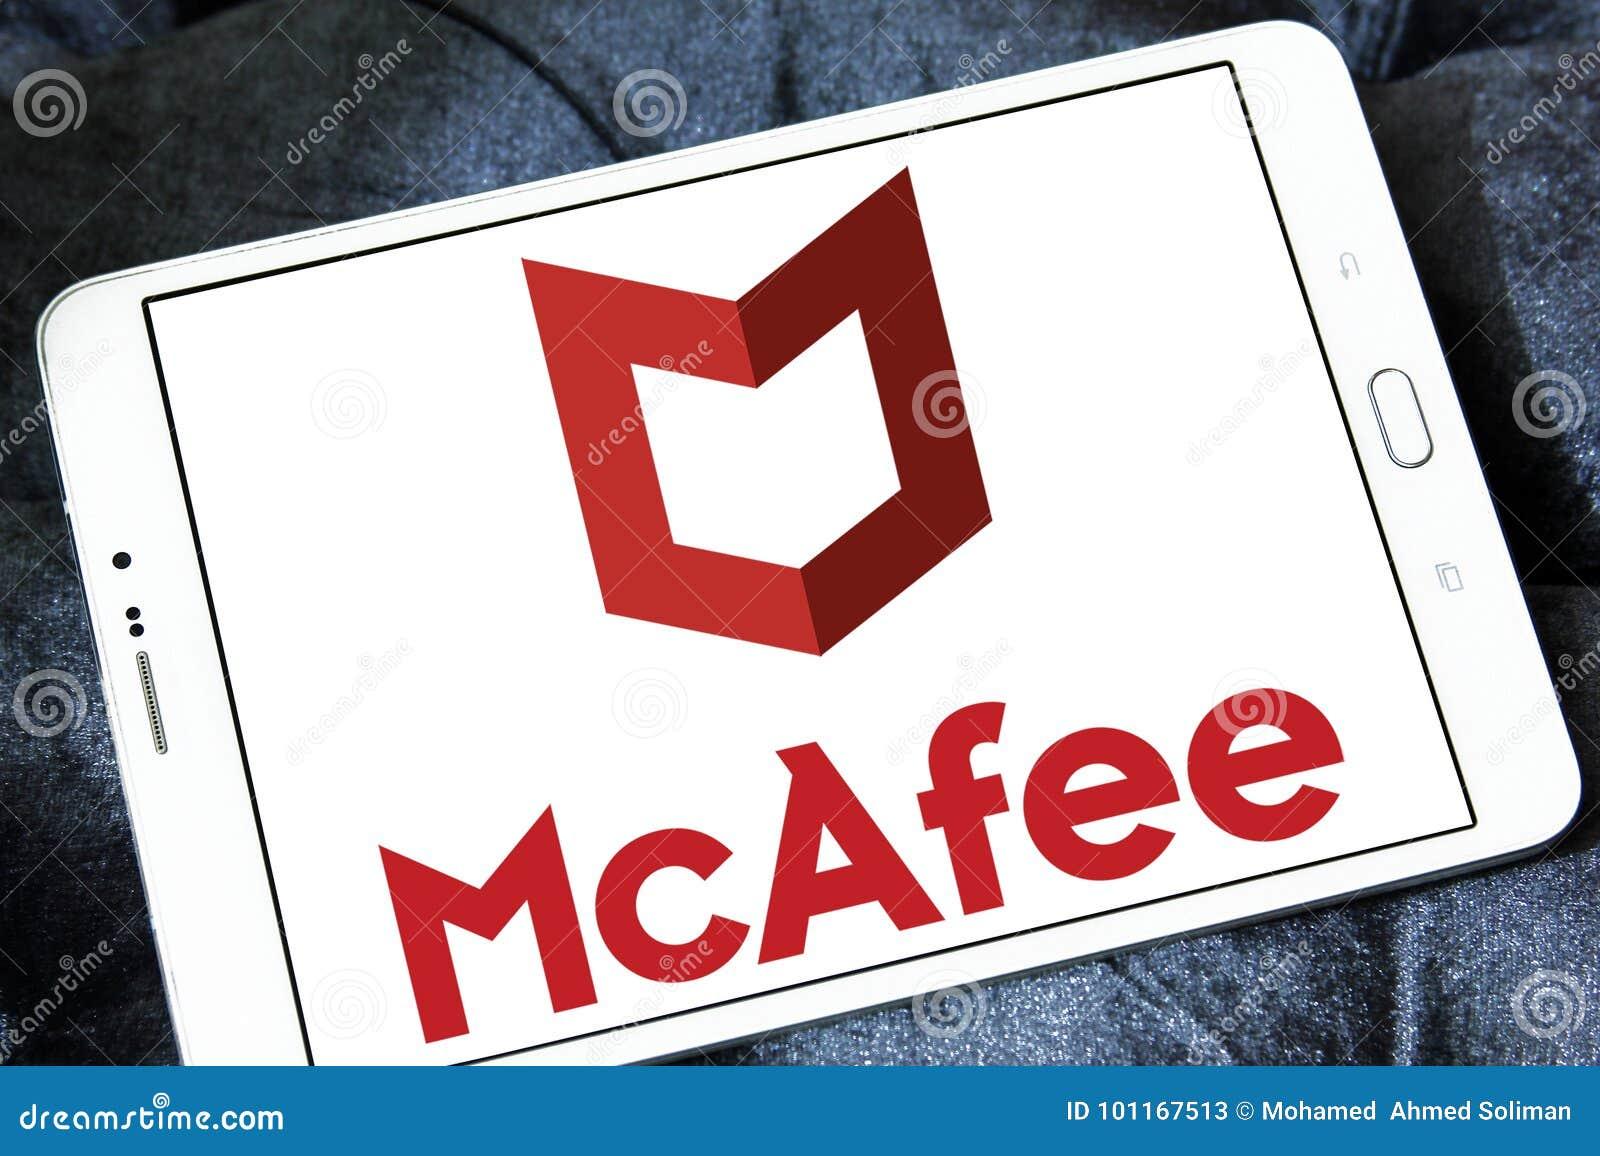 McAfee company logo editorial stock photo  Image of logos - 101167513